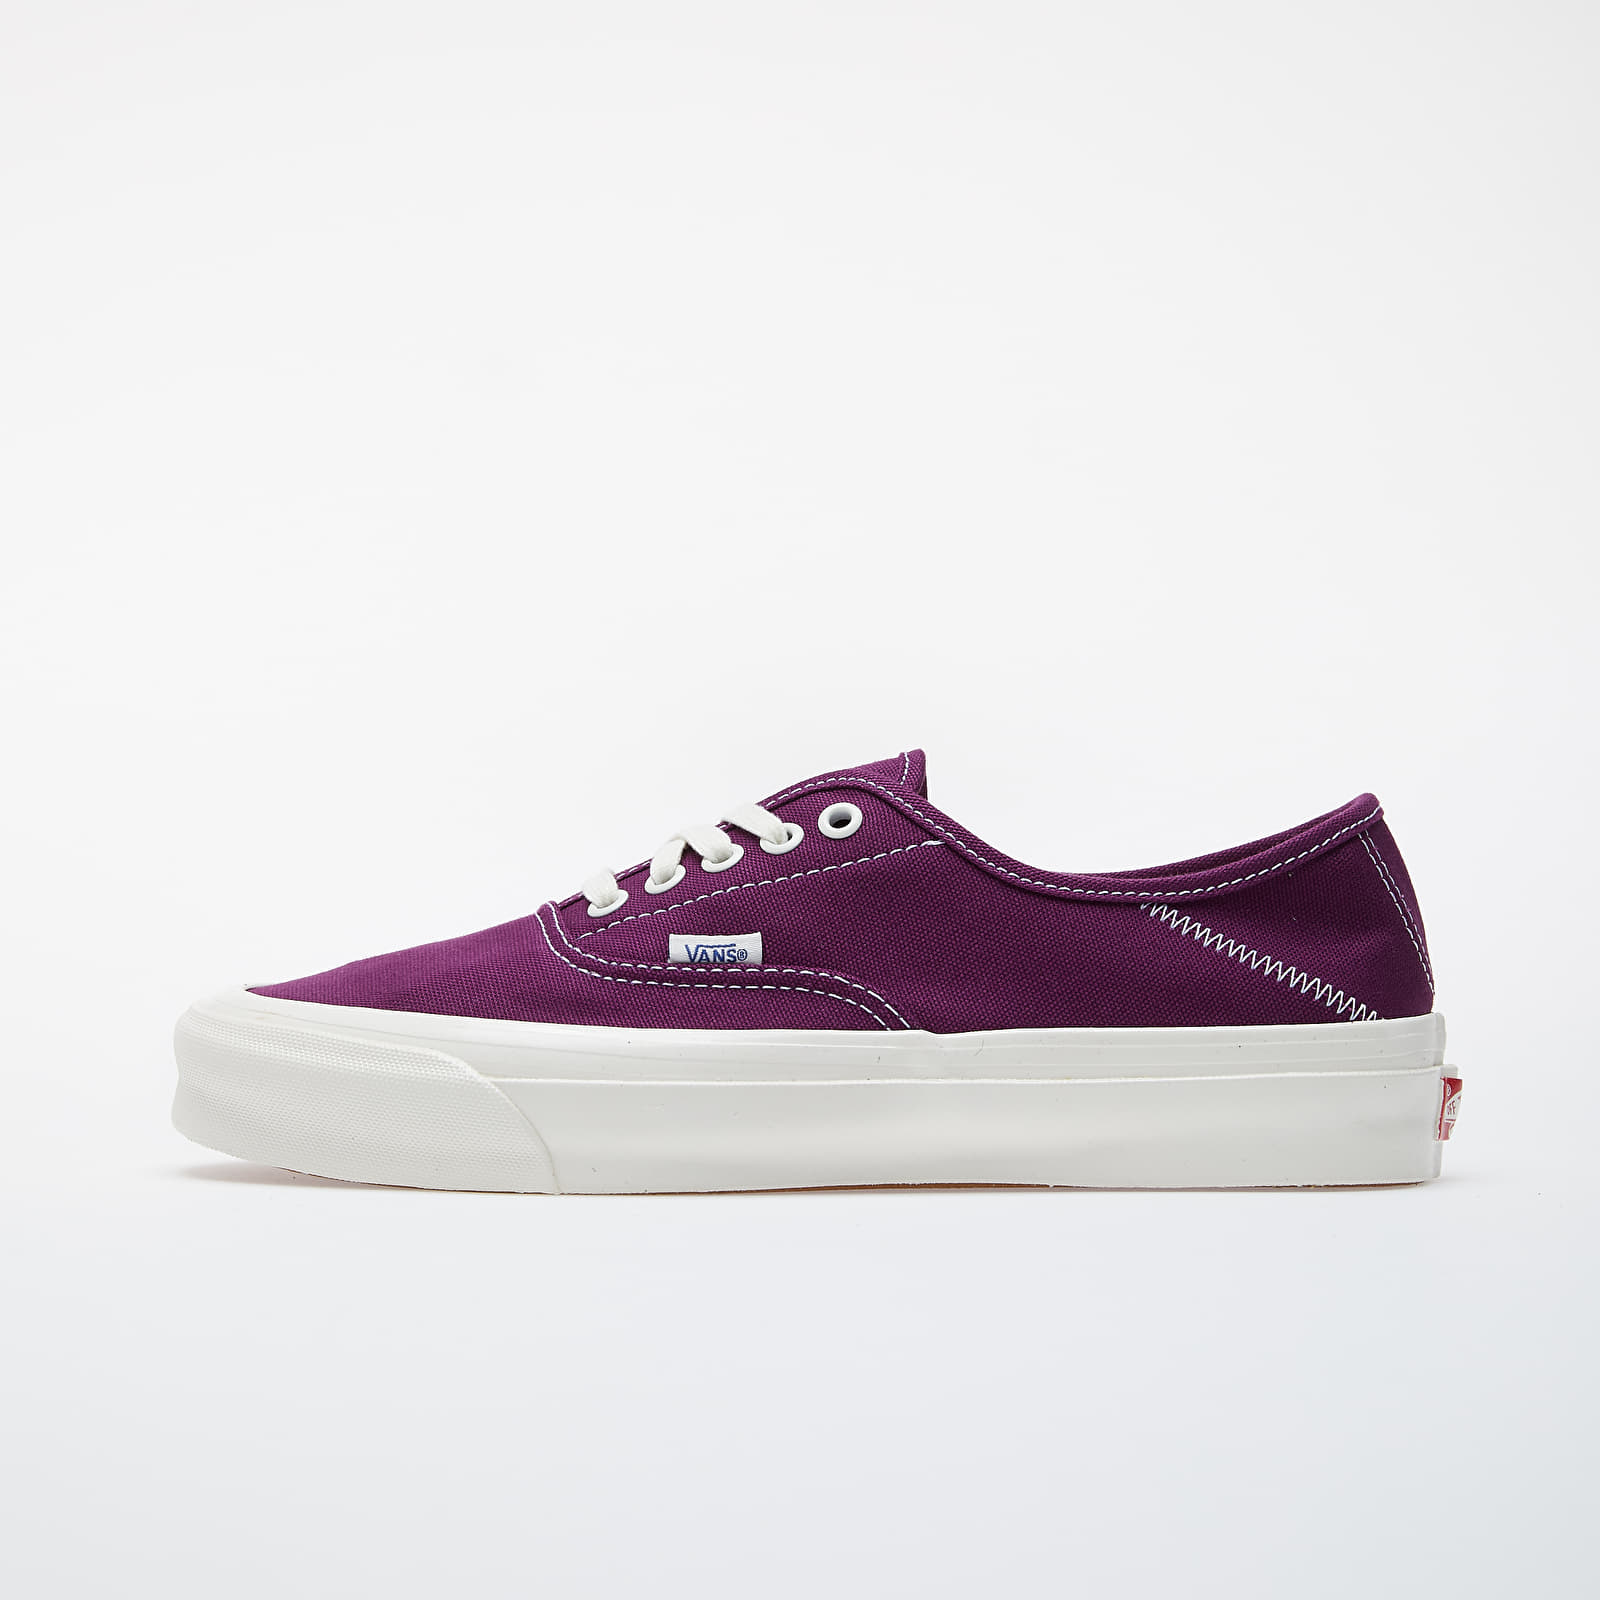 Pánské tenisky a boty Vans OG Style 43 LX (Canvas) Dark Purple/ Marshmallow